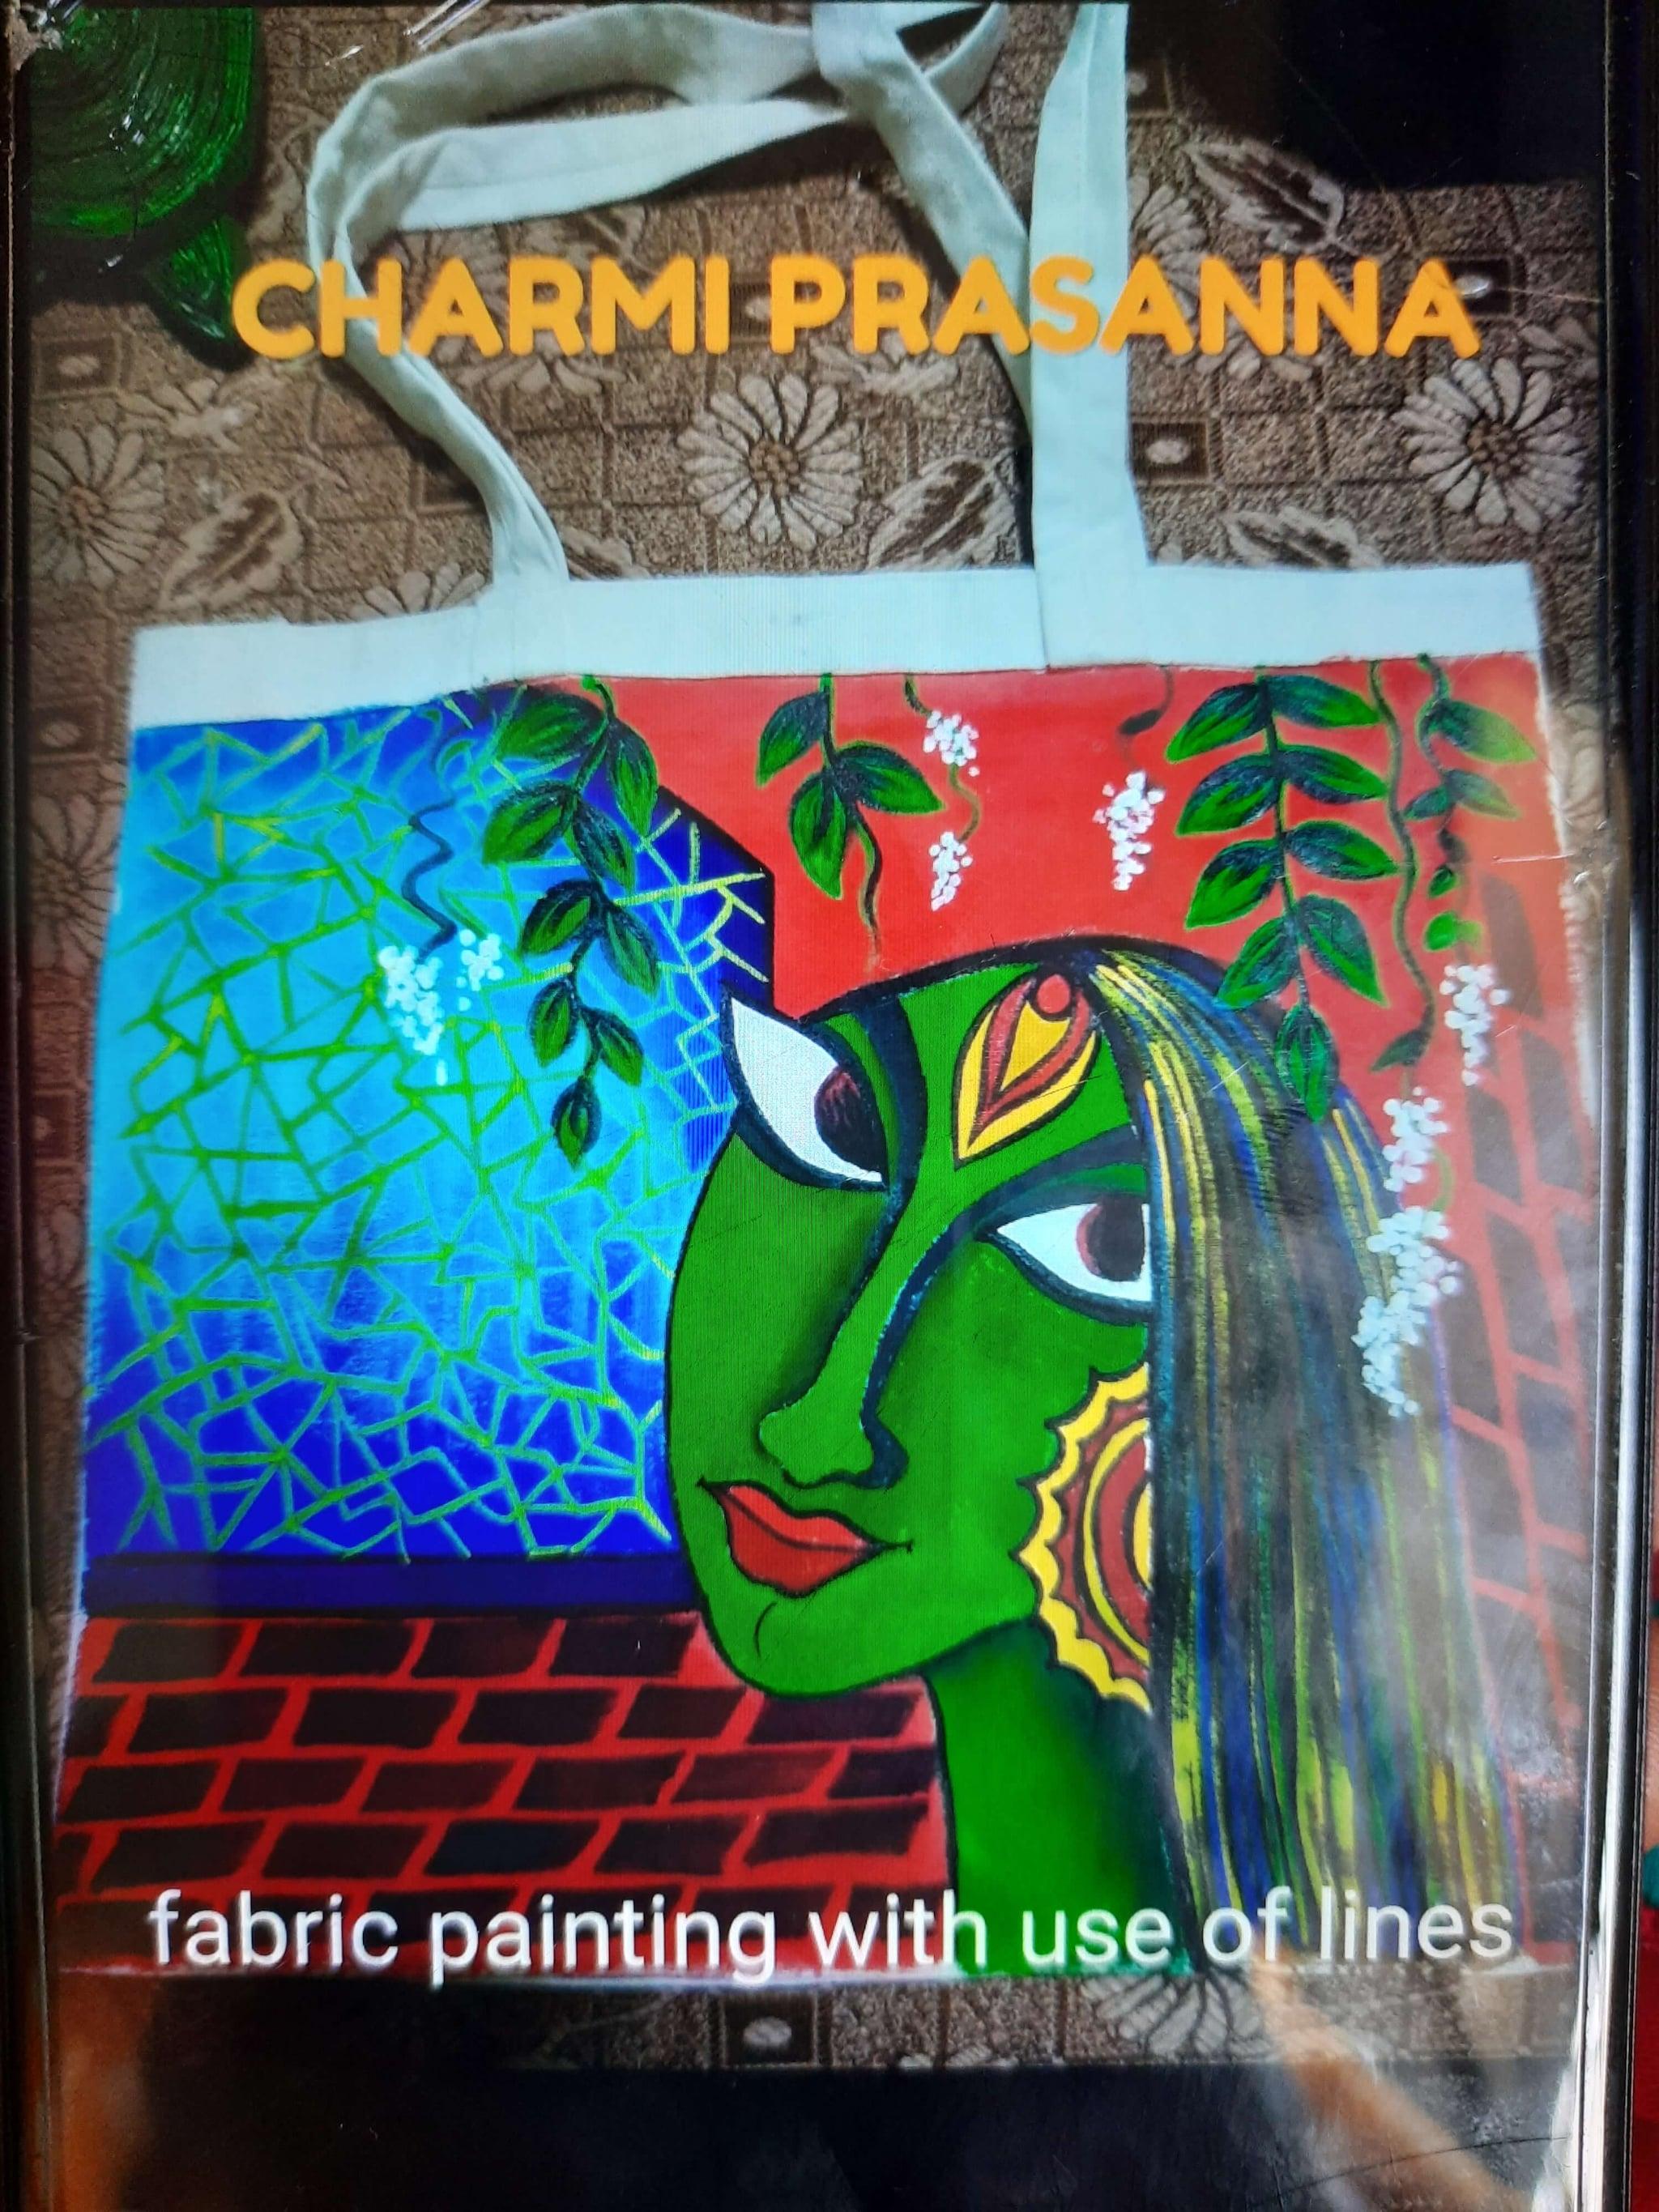 Charmi Prasanna